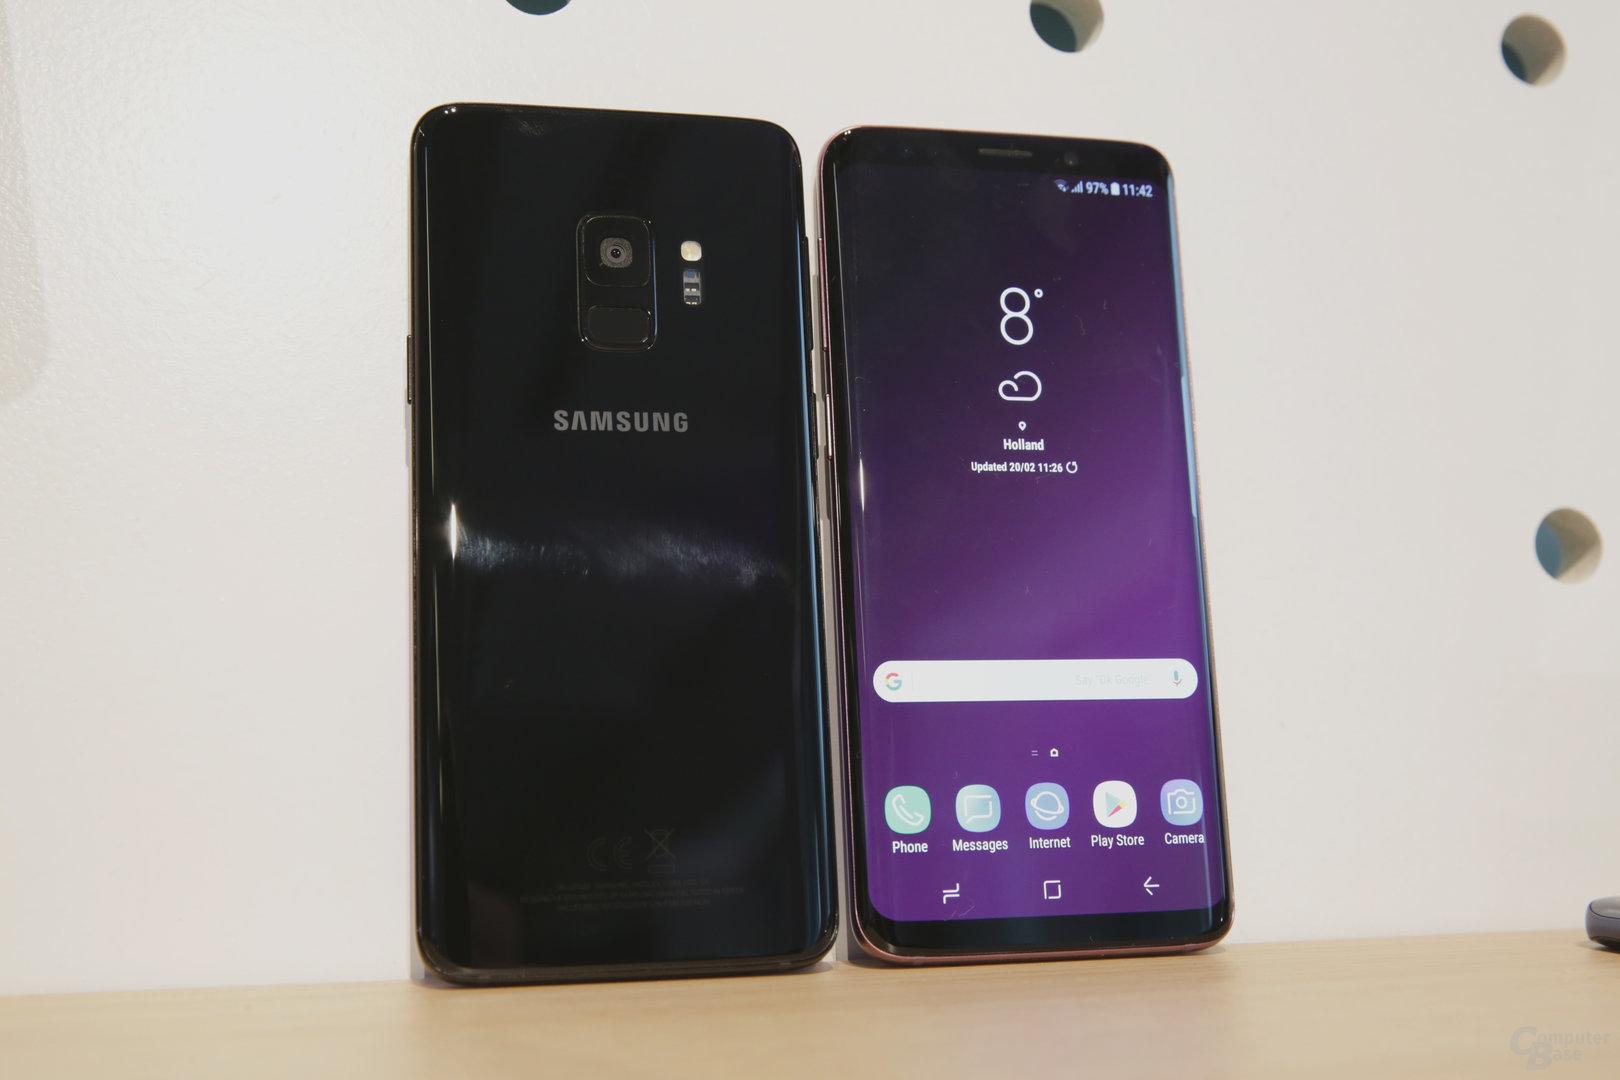 Galaxy S9 mit neuem Fingerabdrucksensor